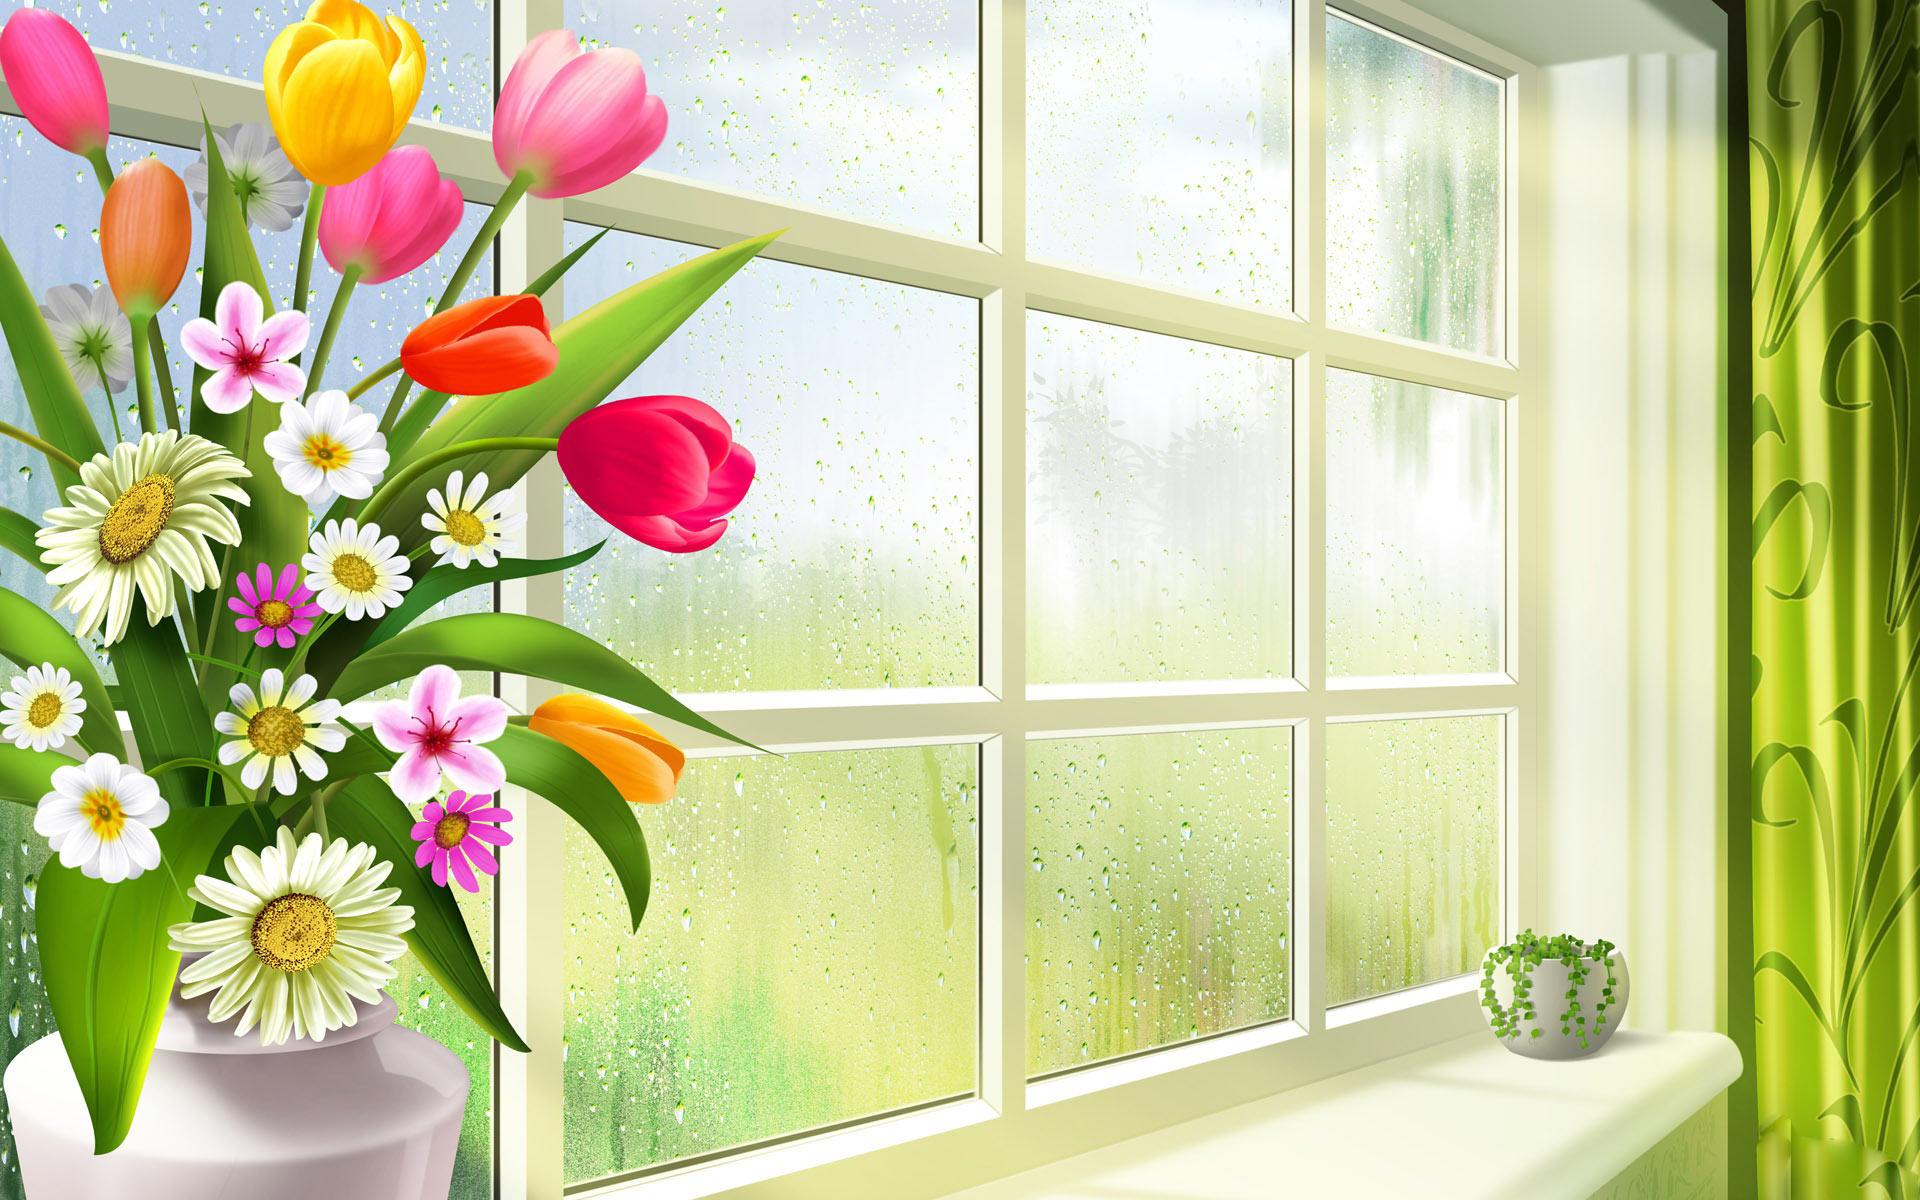 Pretty Spring Desktop Backgrounds wallpaper Pretty Spring Desktop 1920x1200